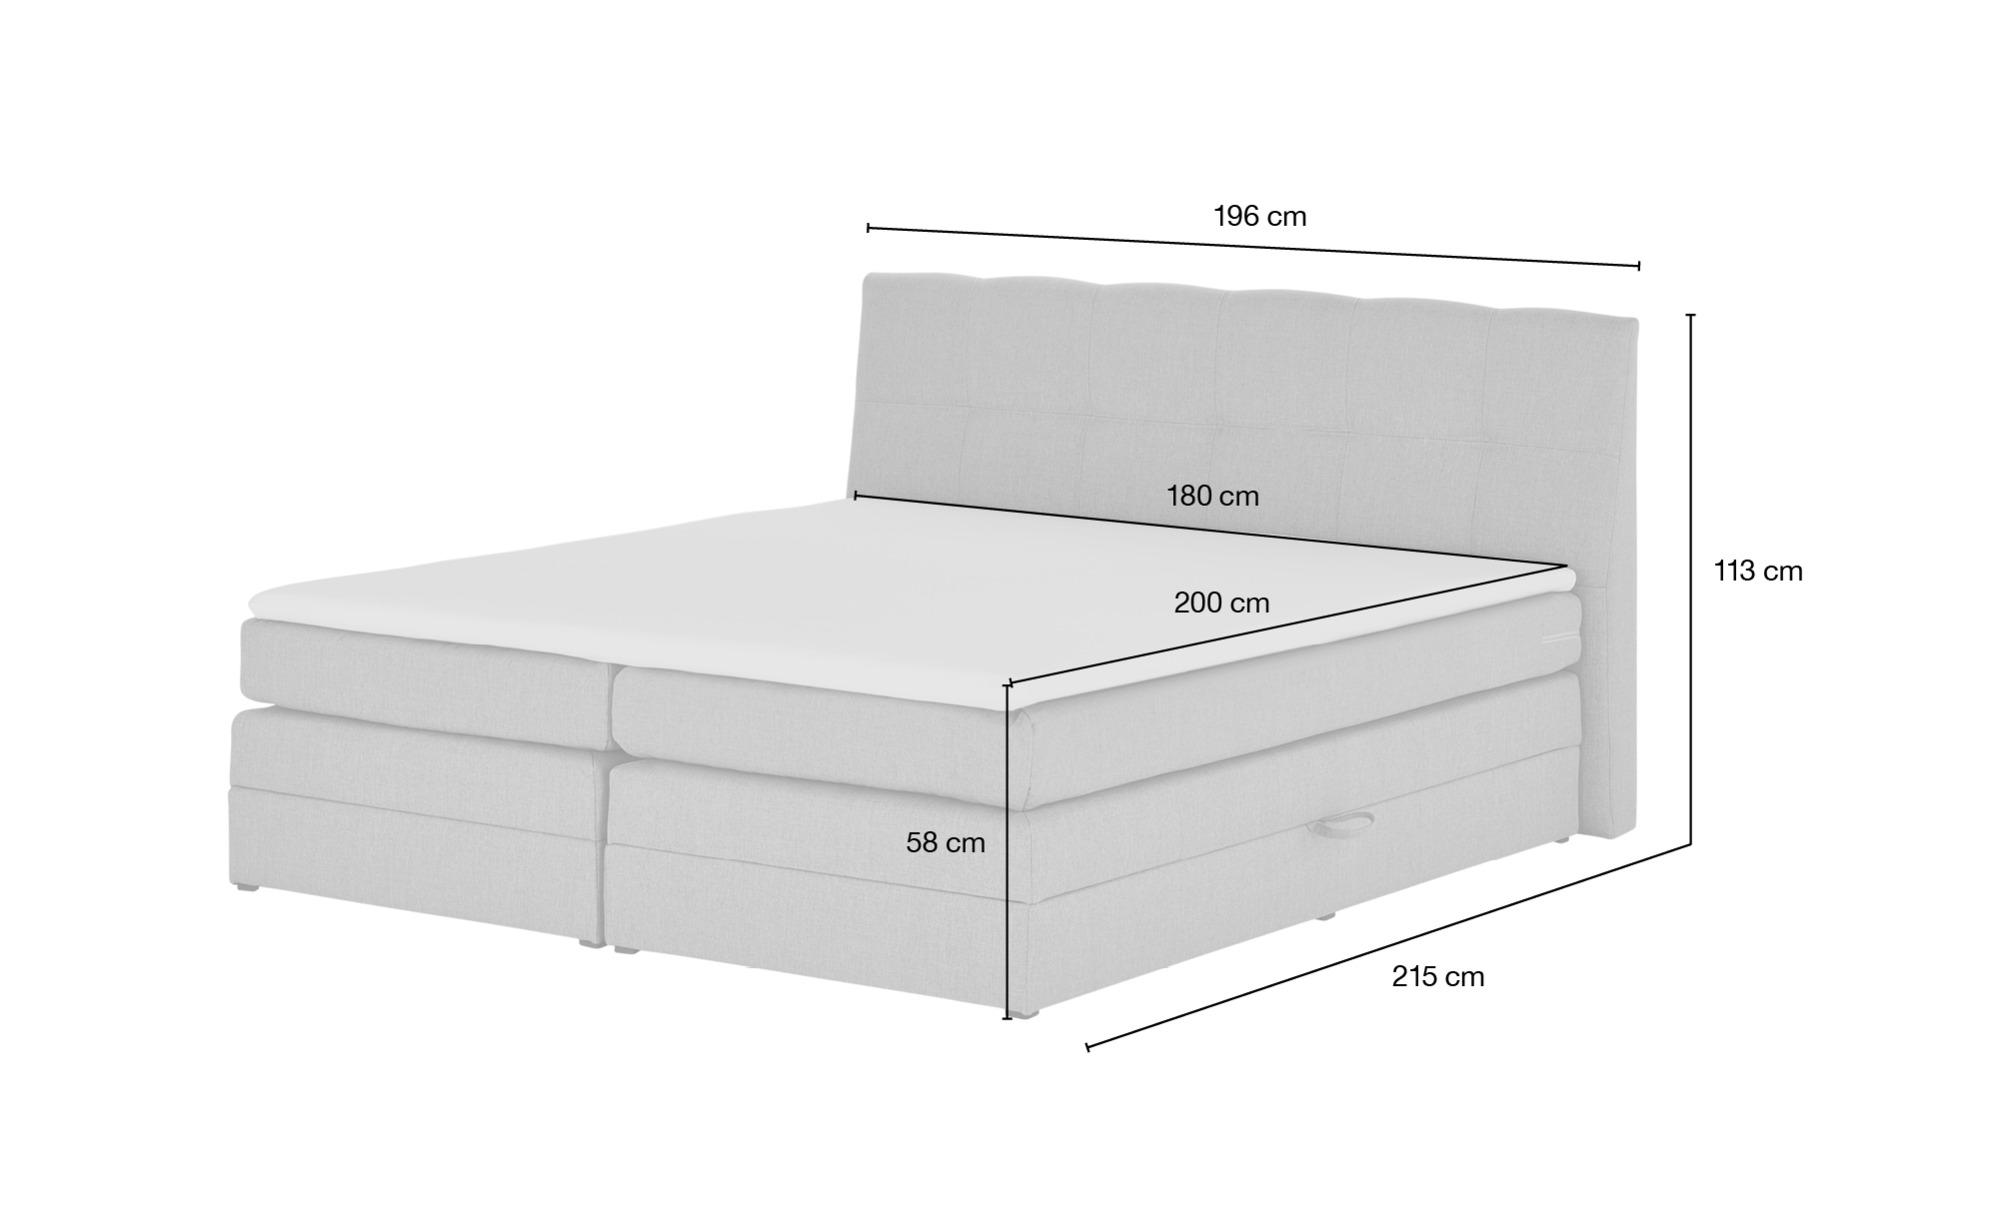 uno Boxspringbett  Saranda ¦ Maße (cm): B: 196 H: 113 Betten > Boxspringbetten > Boxspringbetten 180x200 - Höffner